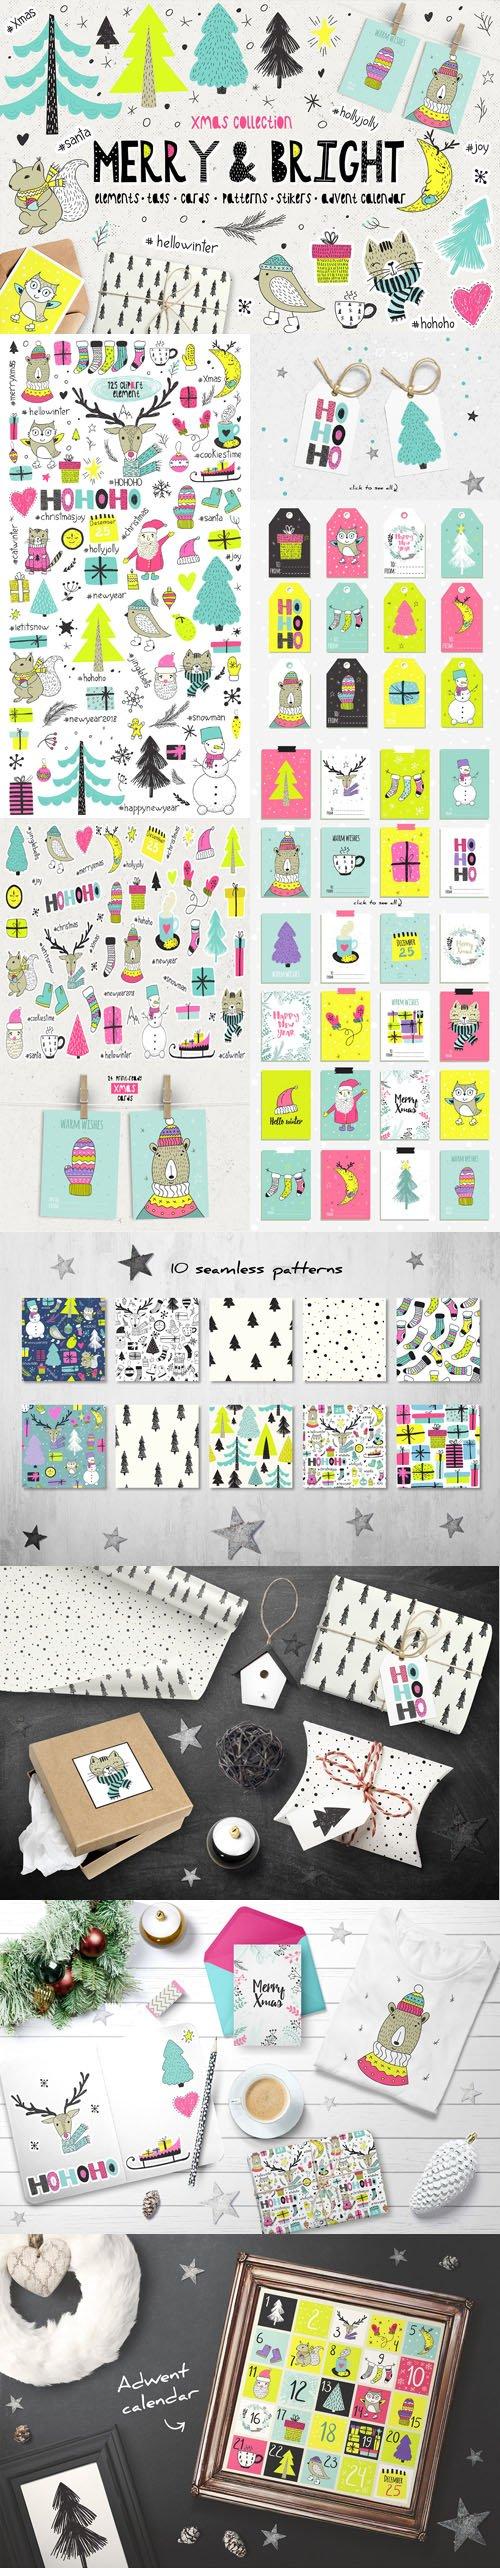 CM - Merry & Bright Xmas - Holiday set